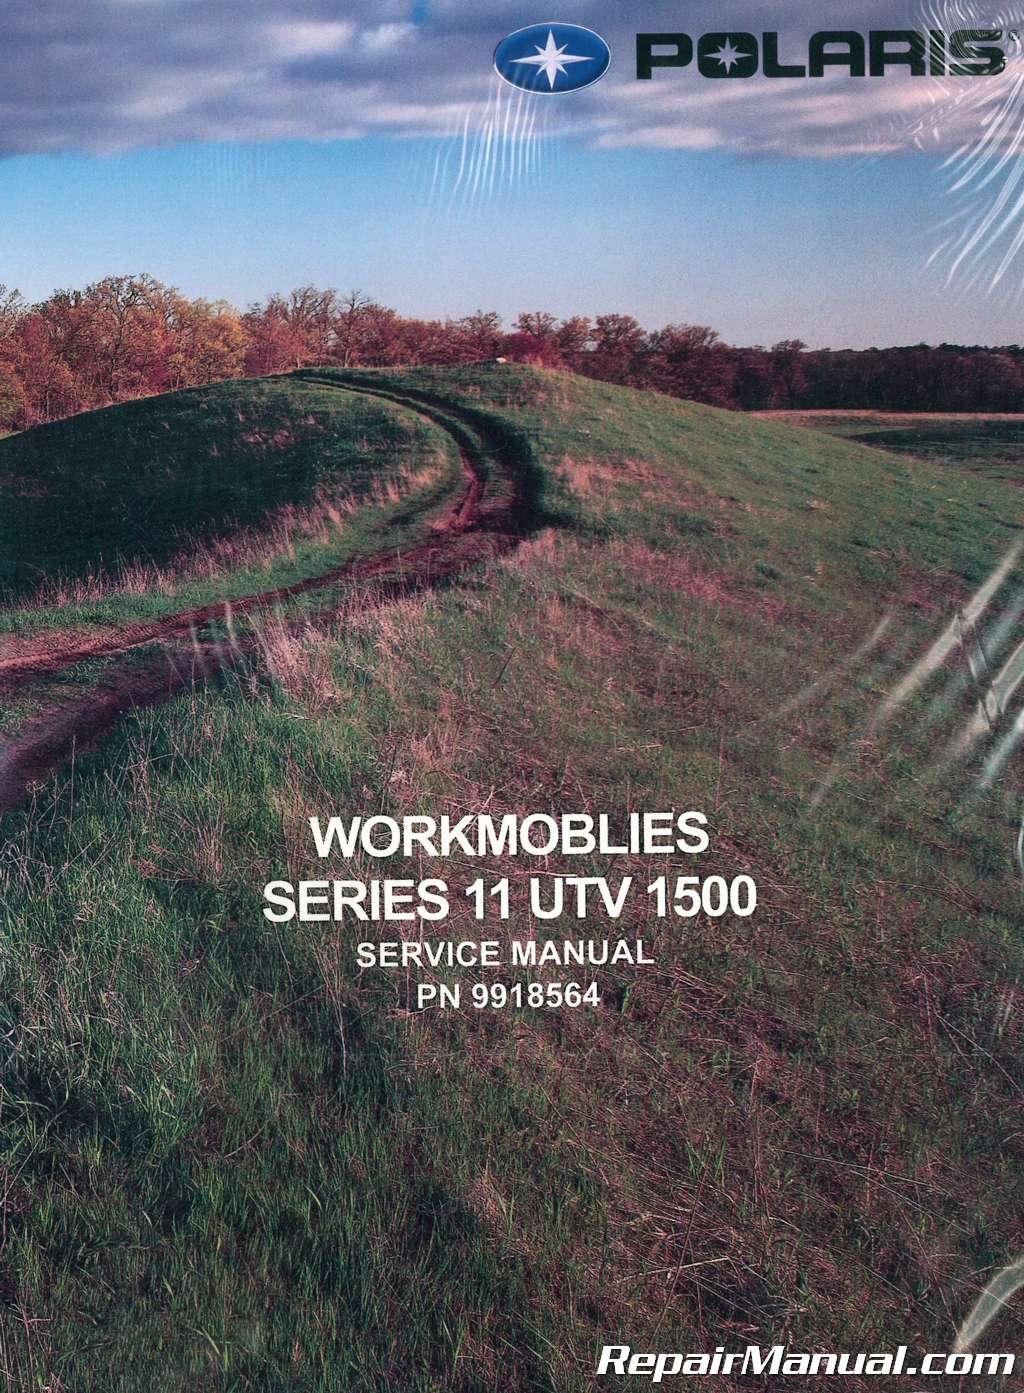 Honda Owners Manual >> 2003-2004 Polaris UTV 1500 2×4 Series 11 Service Manual